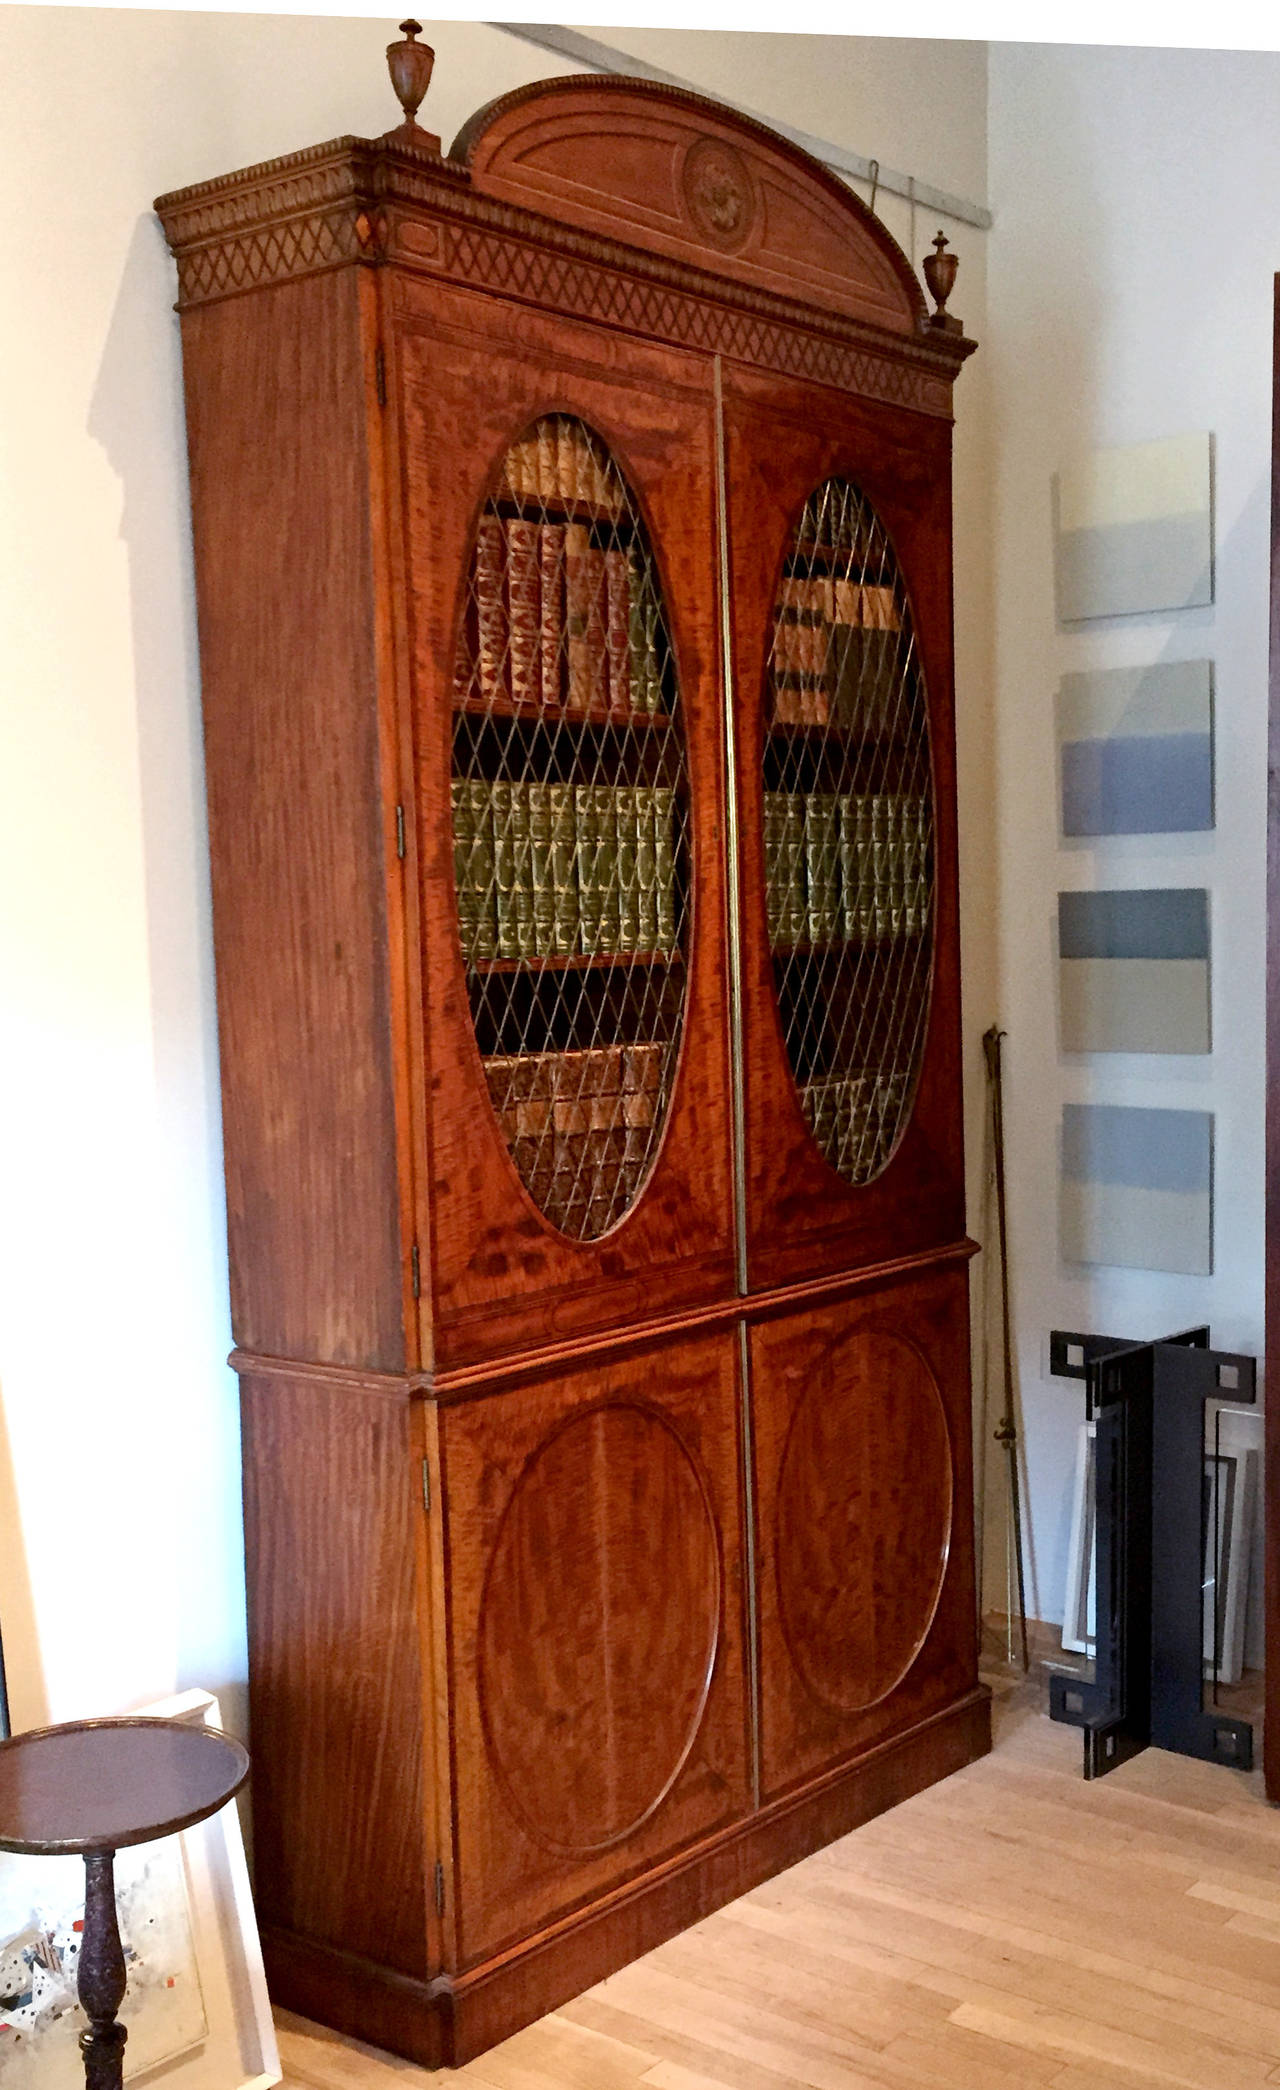 Fine Hepplewhite Decorated Inlaid Satinwood & Mahogany Two-Part Bookcase Cabinet 1